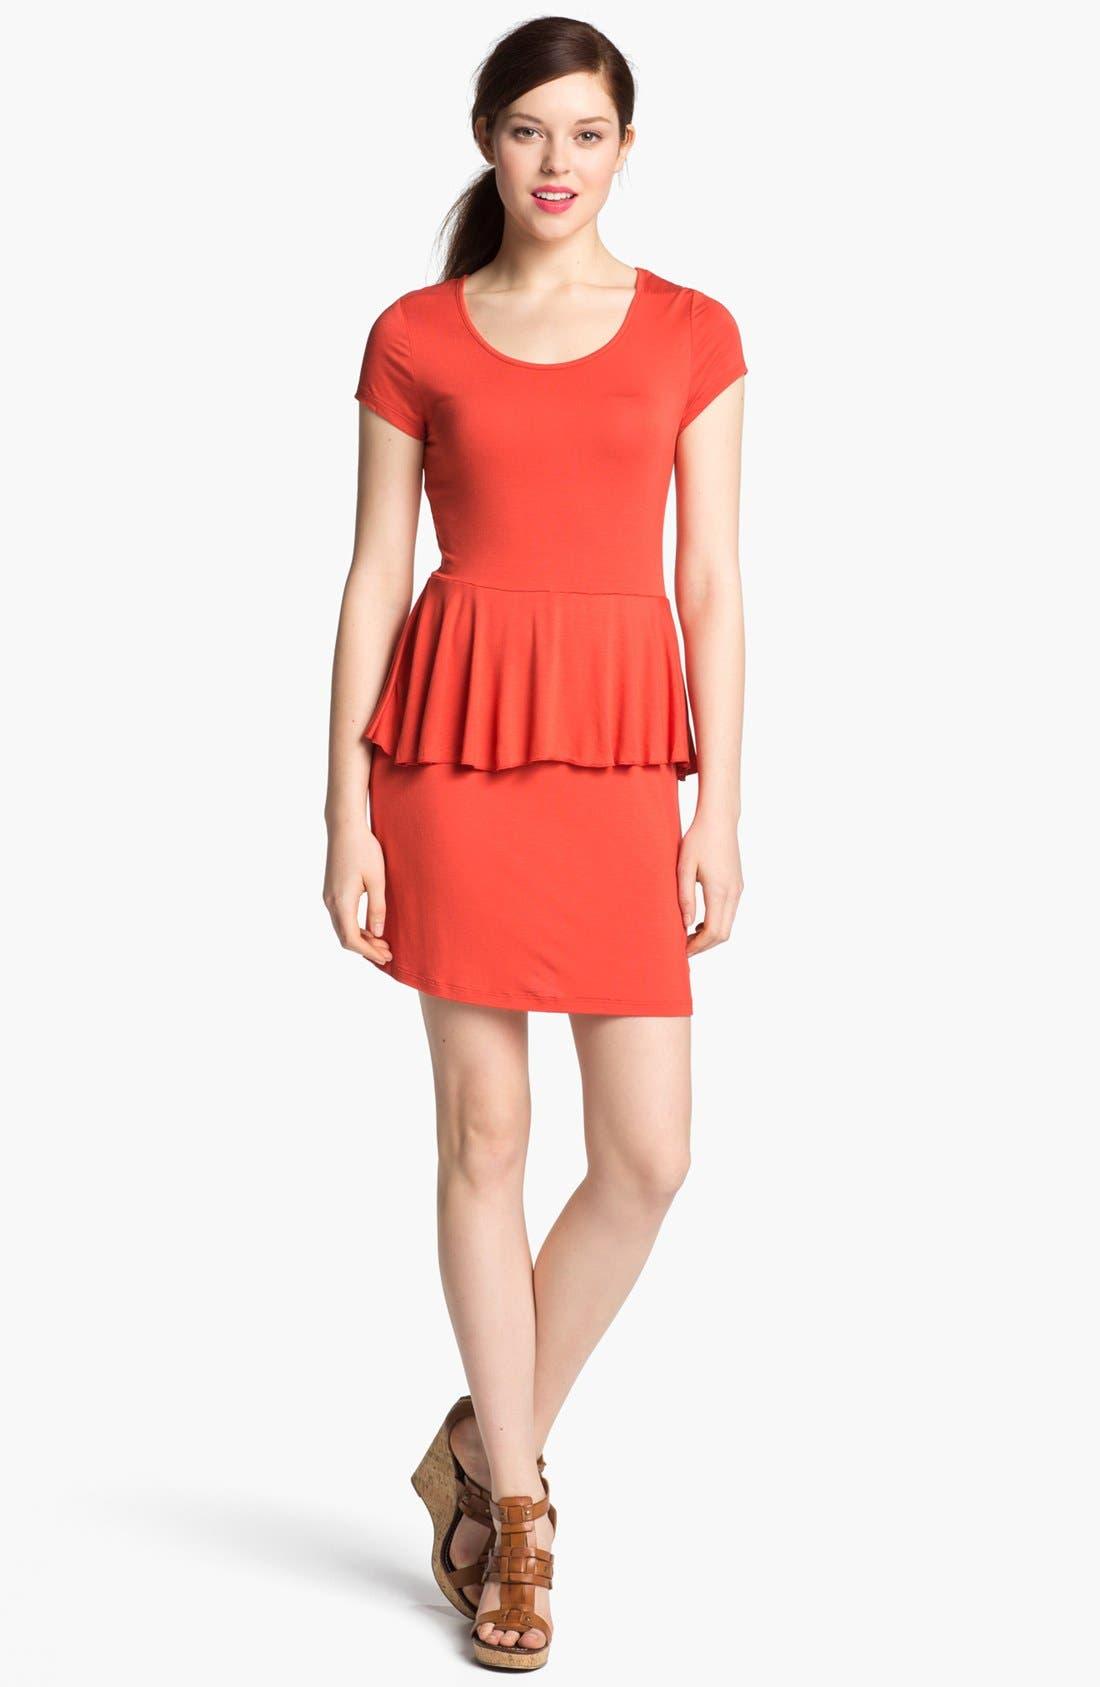 Alternate Image 1 Selected - Kensie Knit Peplum Dress (Online Only)